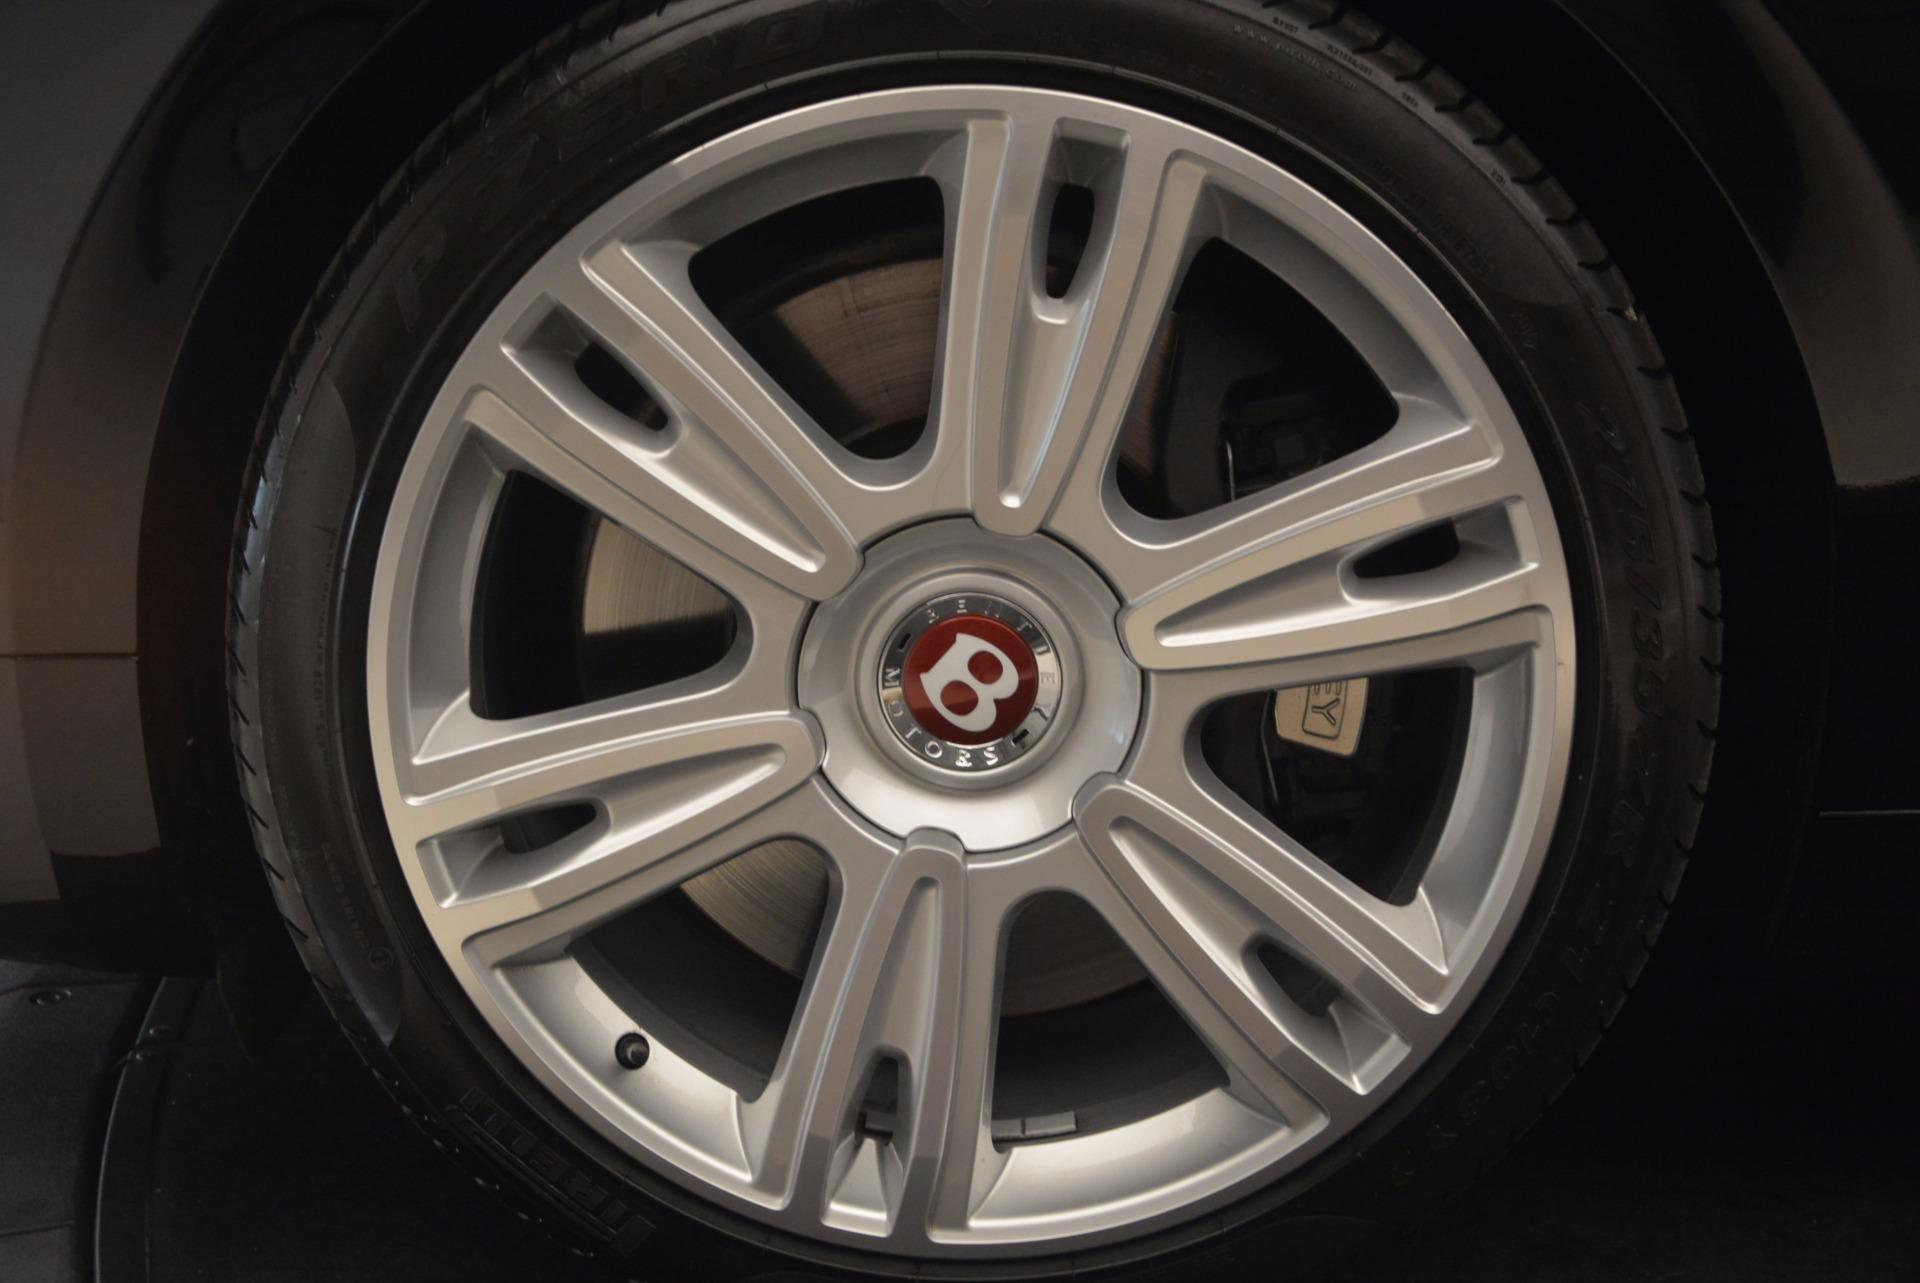 Used 2015 Bentley Flying Spur V8 For Sale In Westport, CT 1199_p18